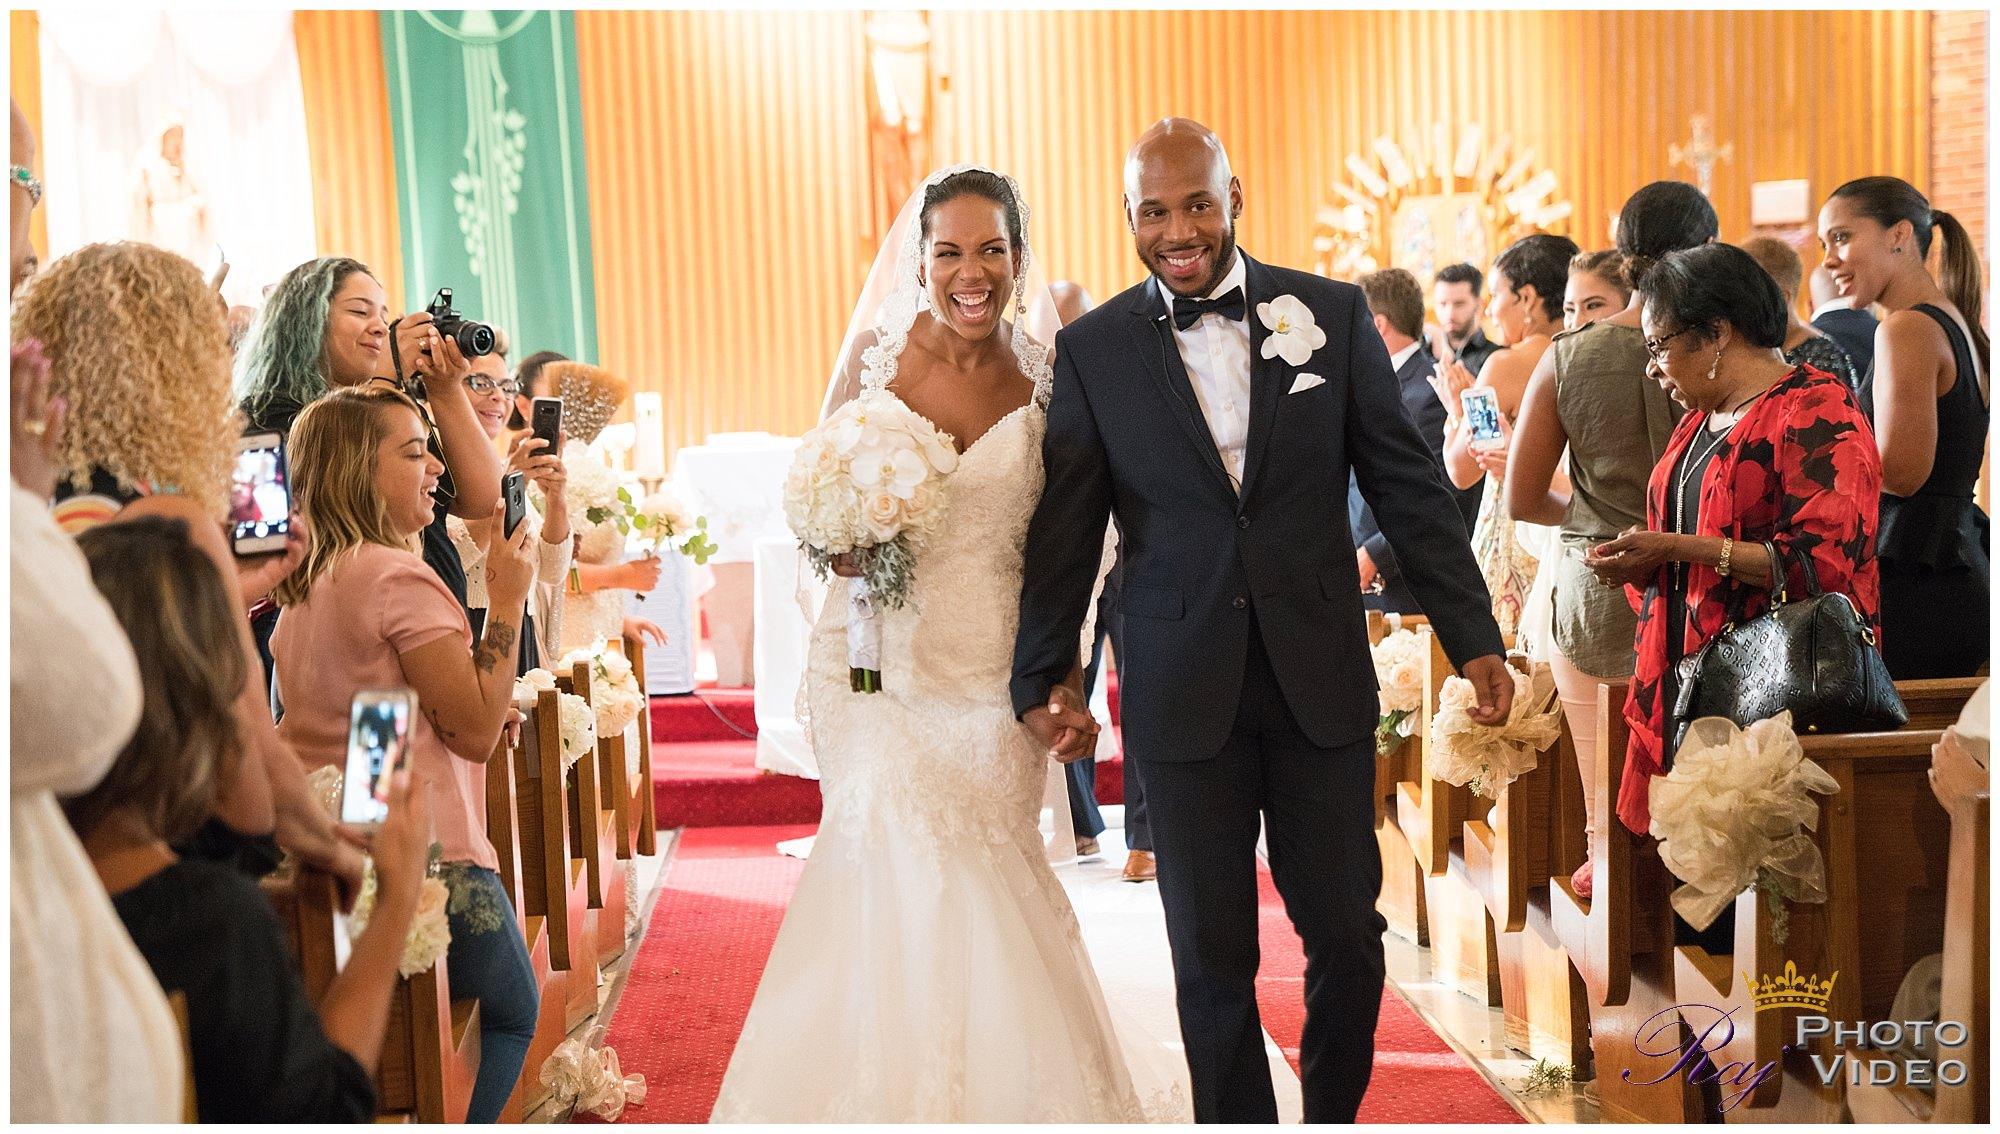 The-Armory-Perth-Amboy-NJ-Catholic-Wedding-Yudelkis-Stephen-11.jpg